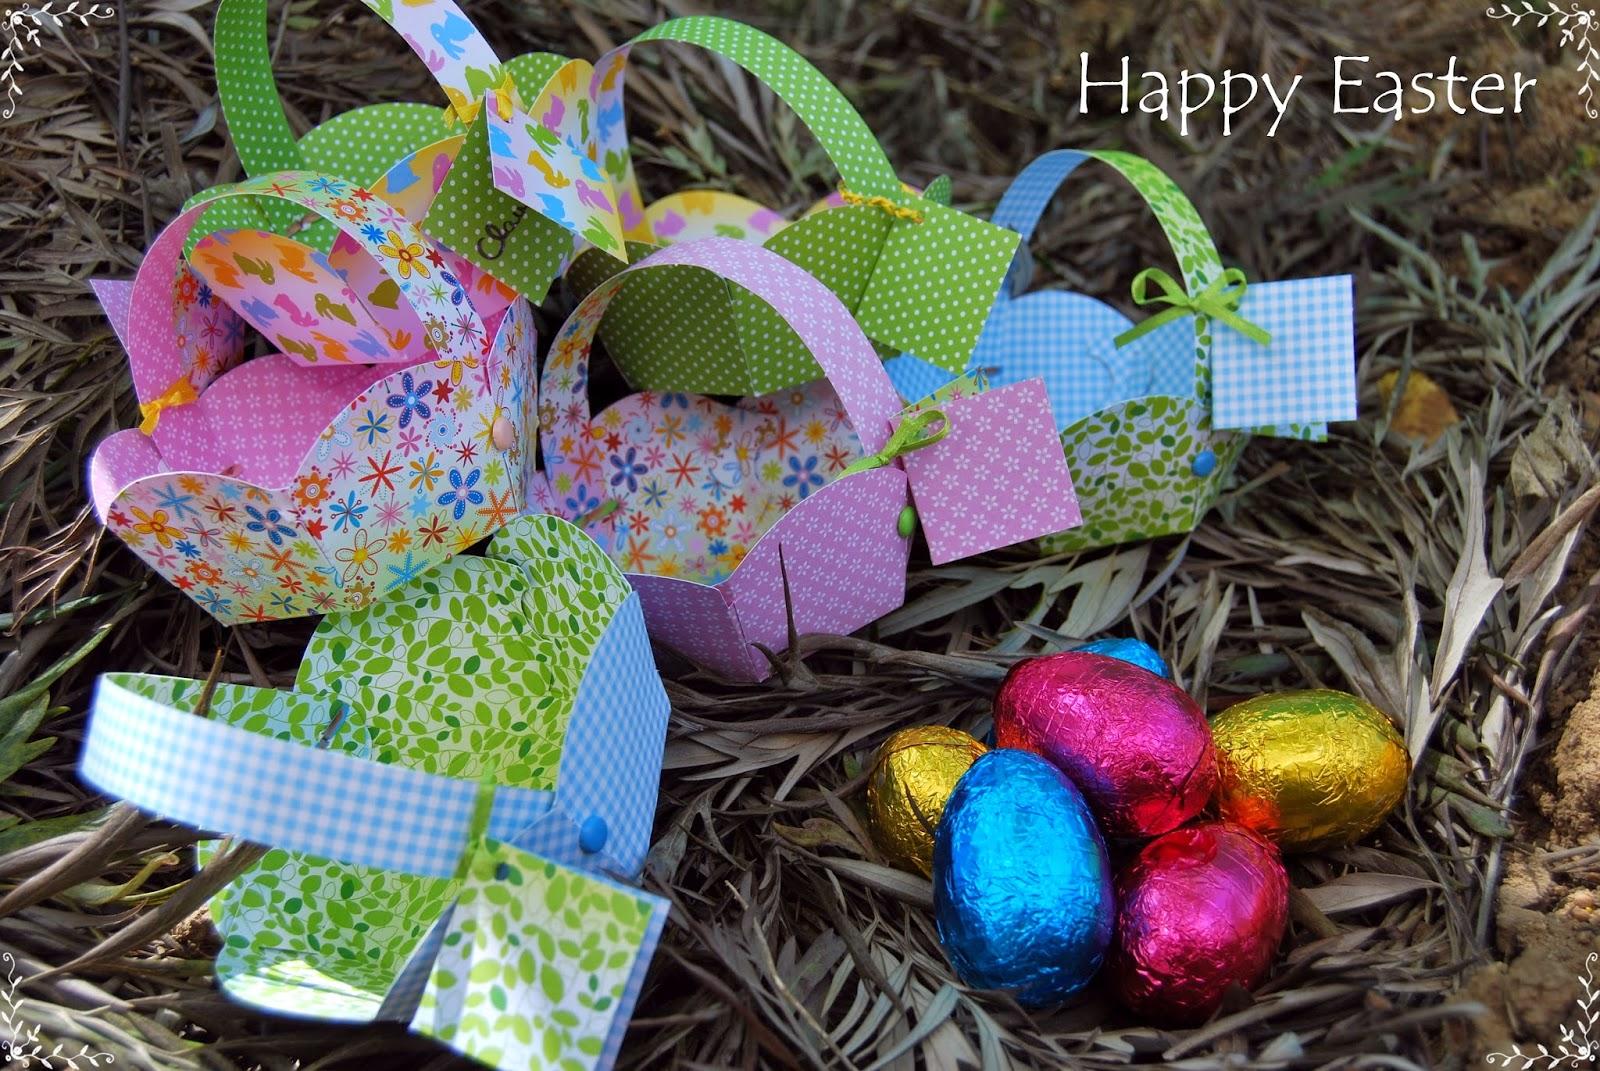 Búsqueda de huevos de Pascua 1